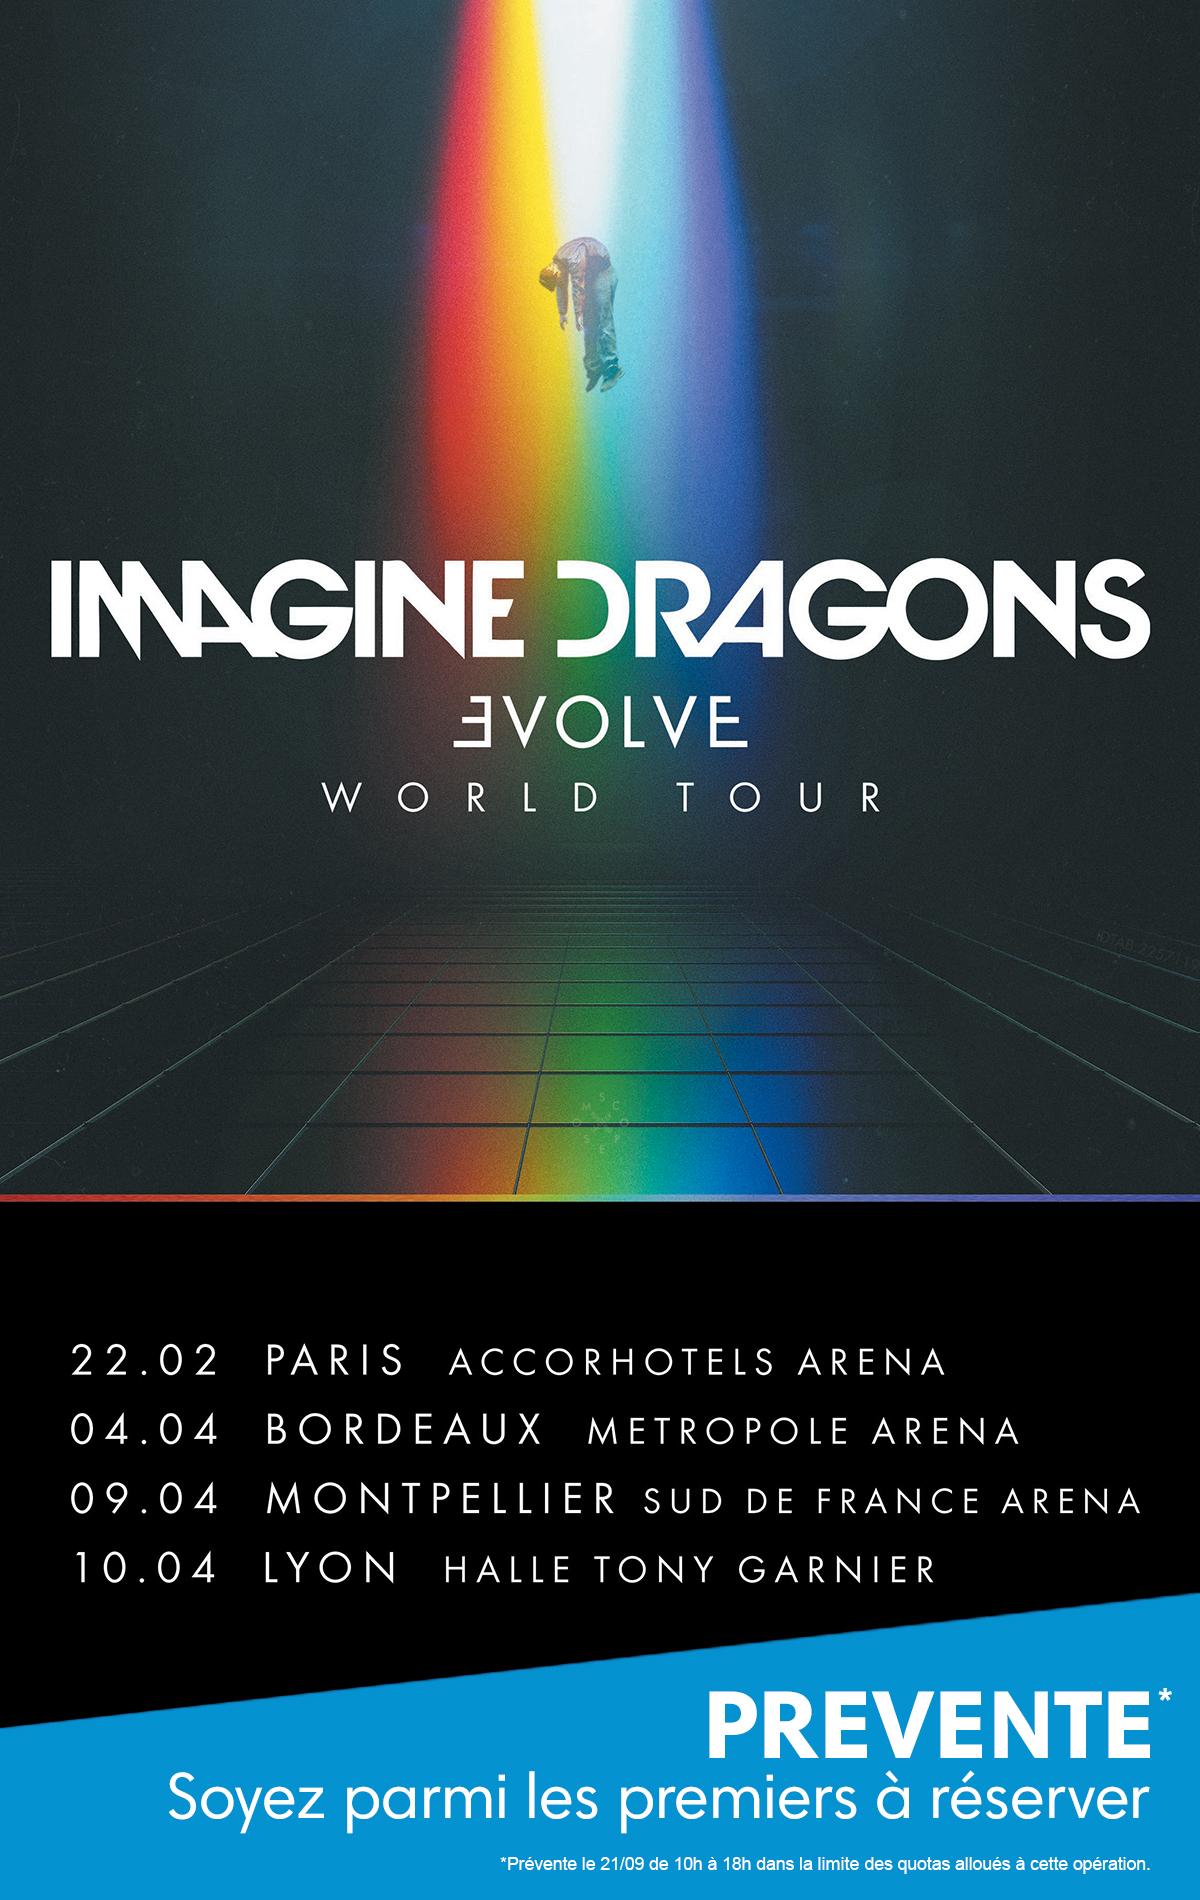 imagine dragons tour 2017 - photo #3